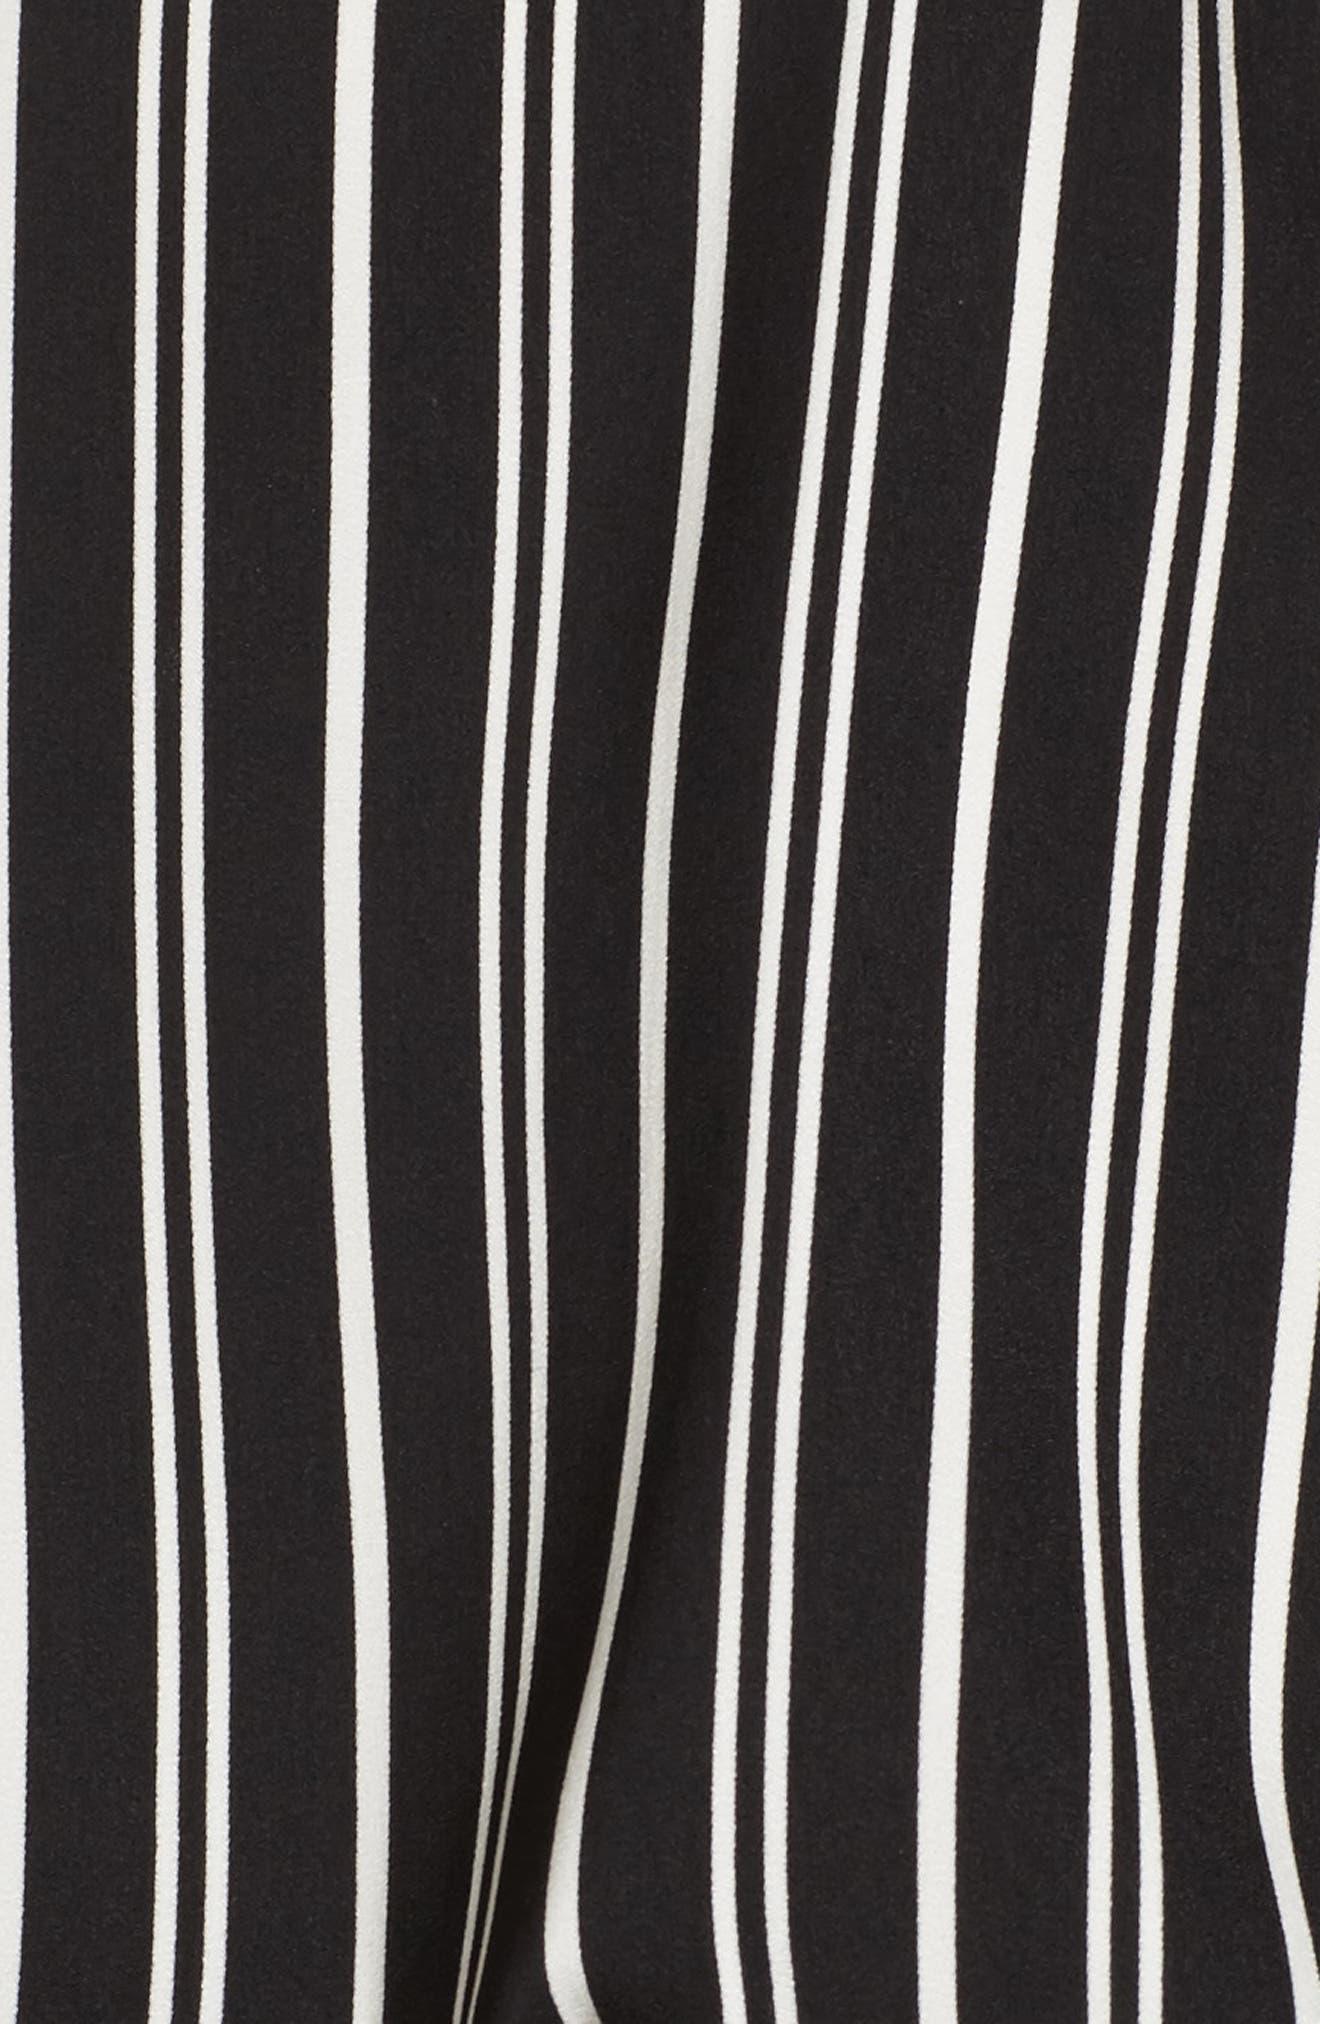 Ophelia Stripe Flare Cuff Top,                             Alternate thumbnail 5, color,                             Black W/ Ivory